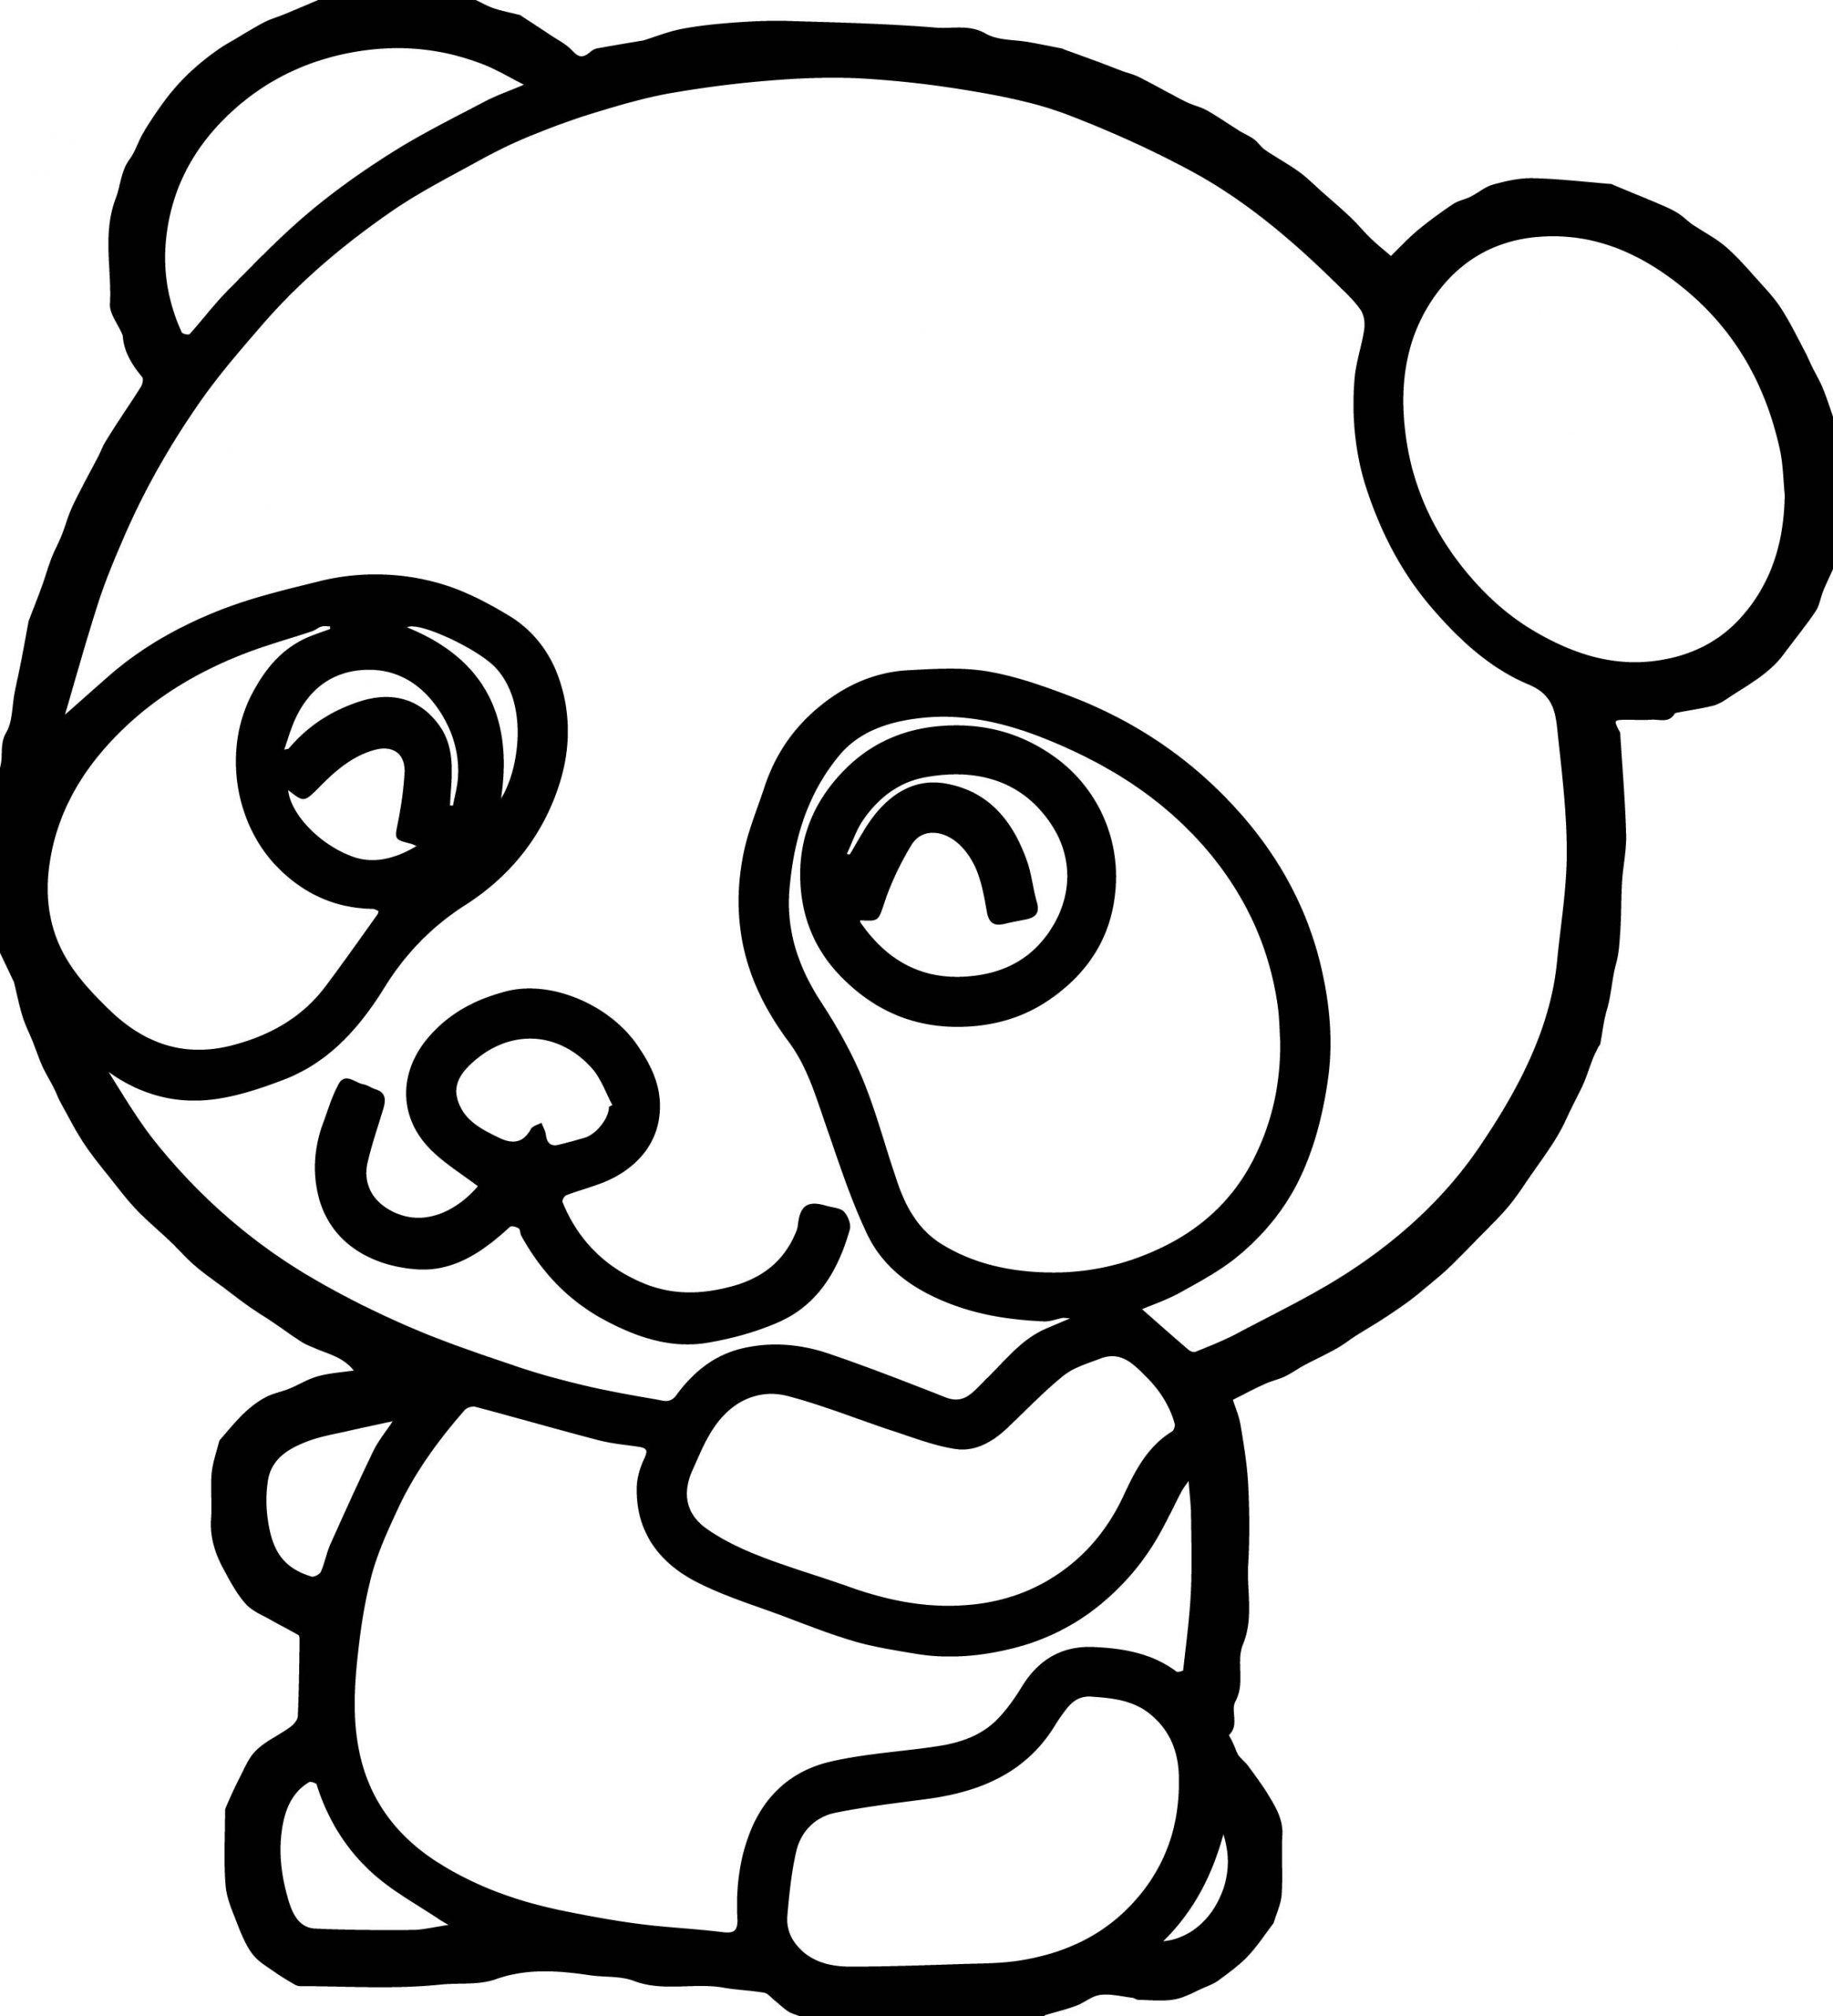 Superb Panda Coloring Pages Emoji Coloring Pages Panda Coloring Pages Monster Coloring Pages